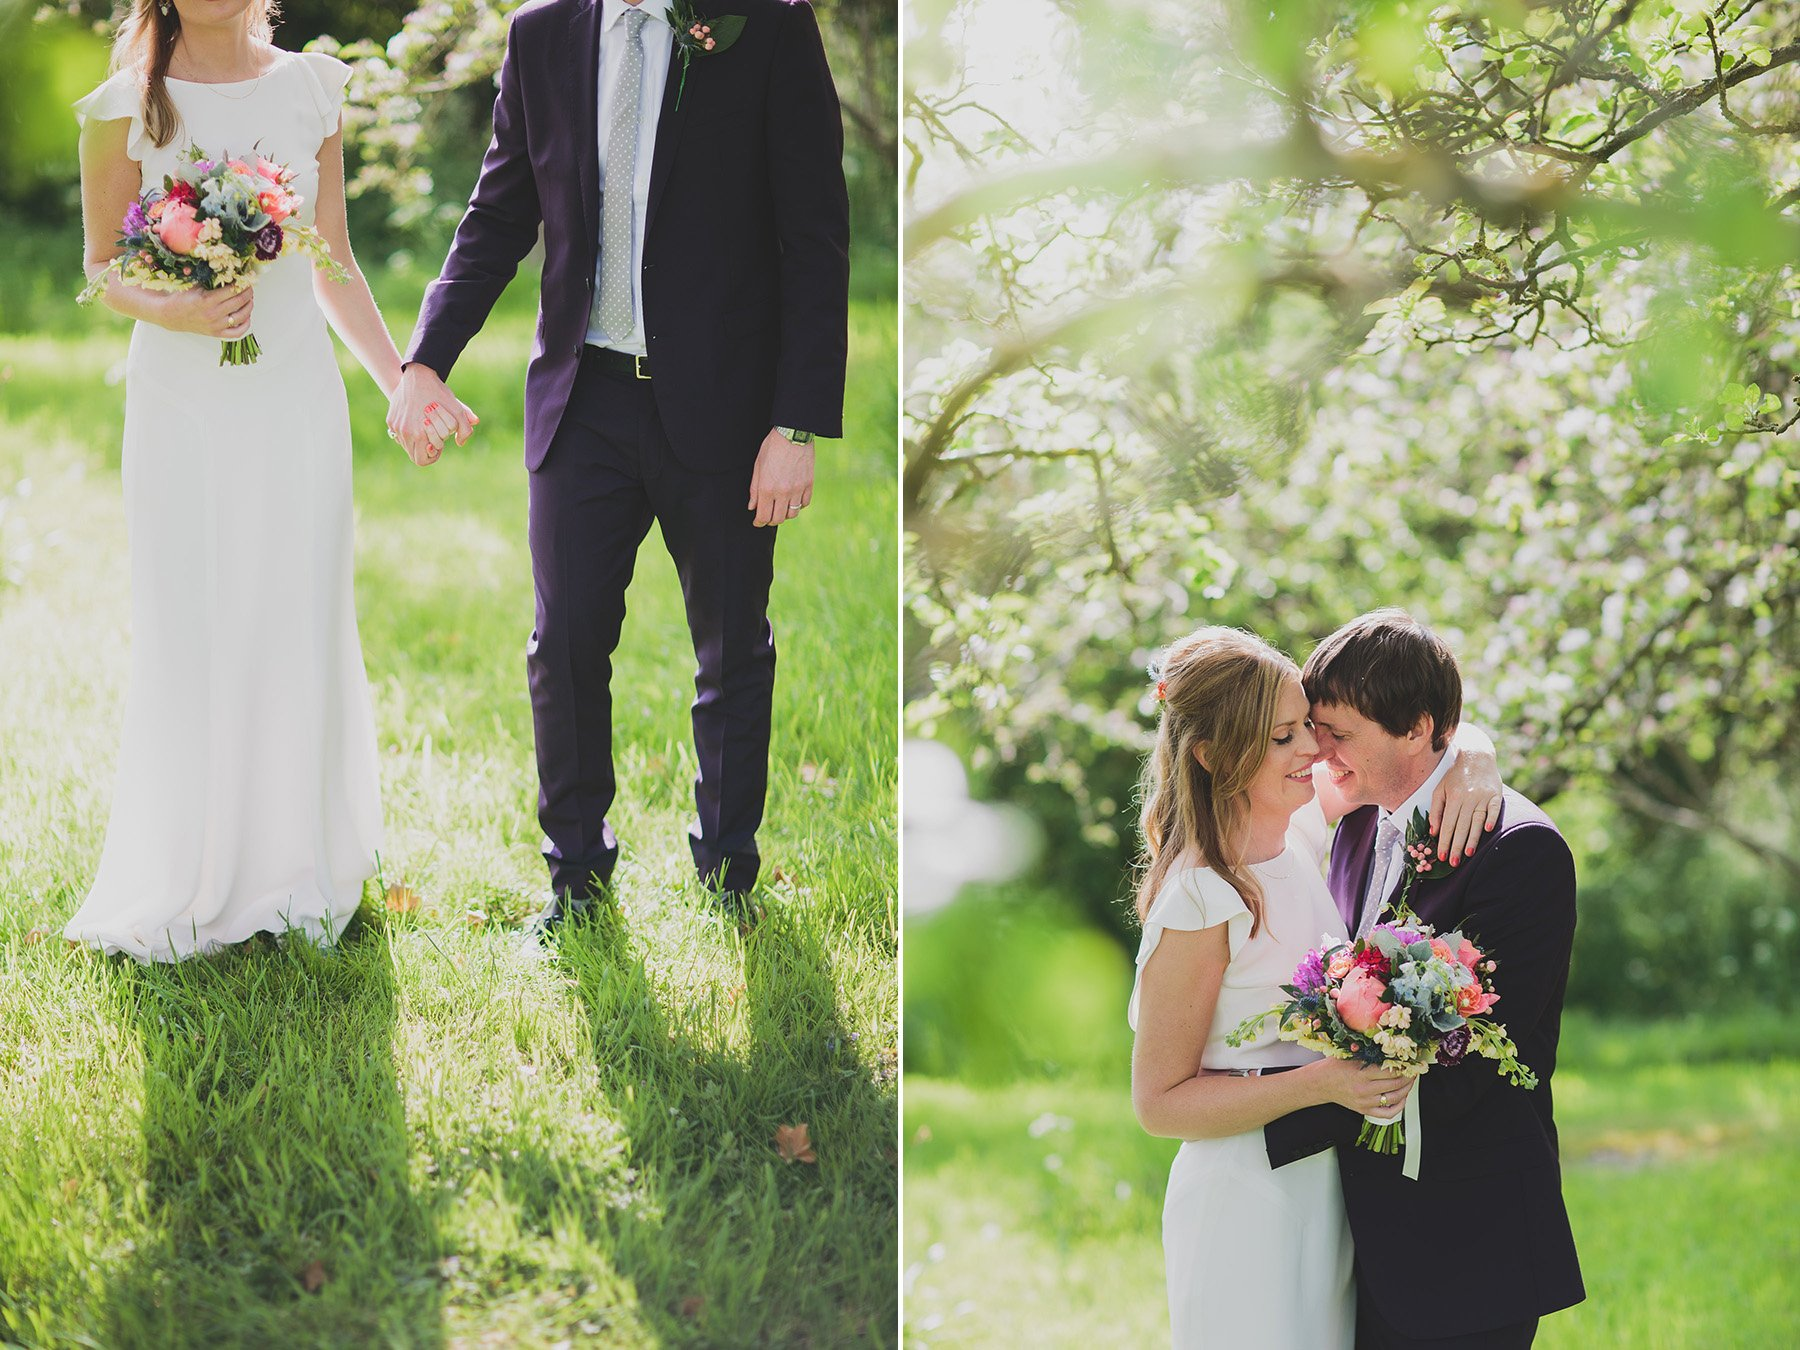 Buckinghamshire-Wedding-Lizzie-Duncan-102